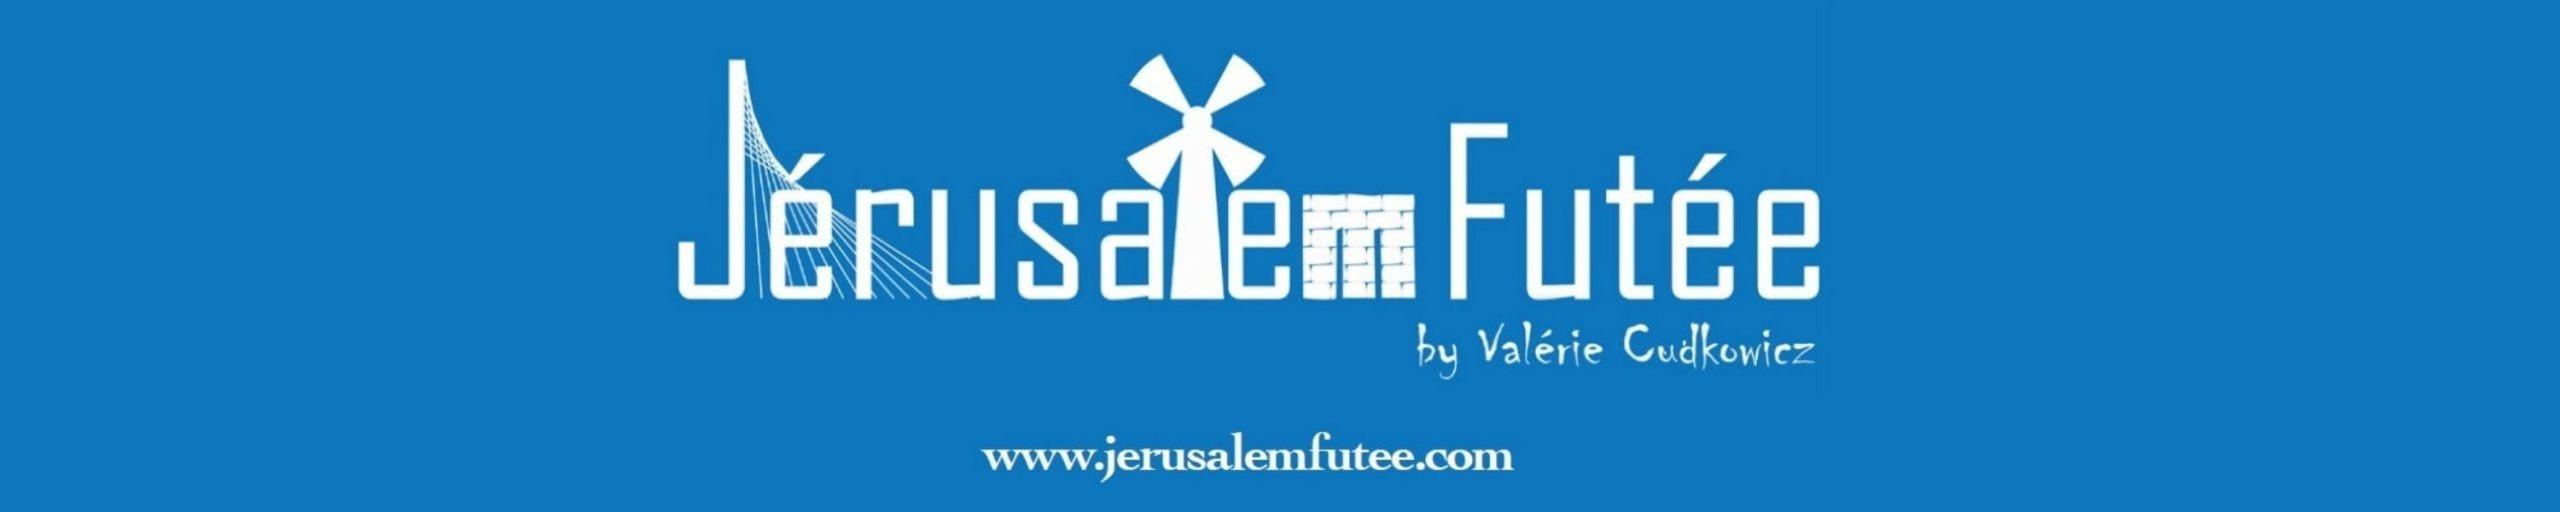 JerusalemFutee